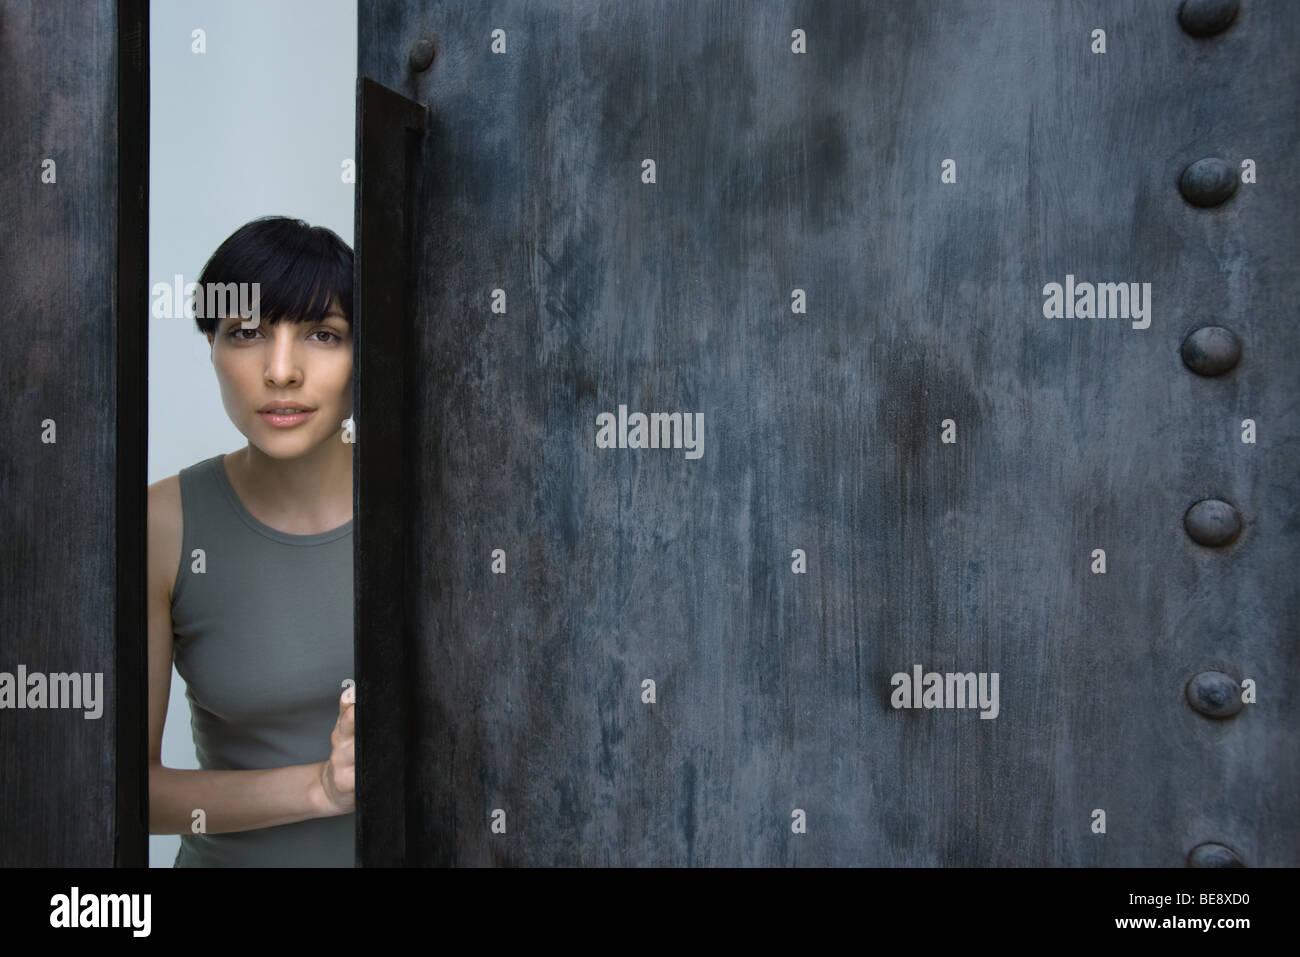 Woman opening door, looking at camera - Stock Image